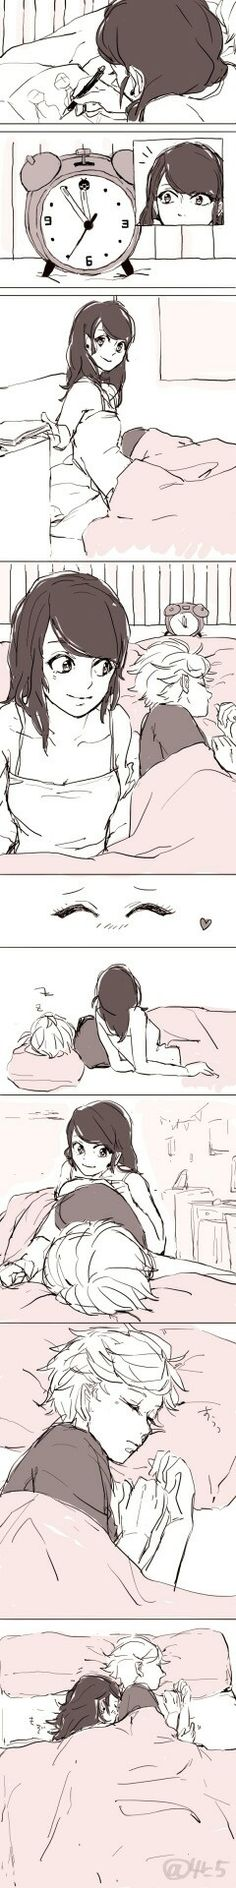 Sleeping part1